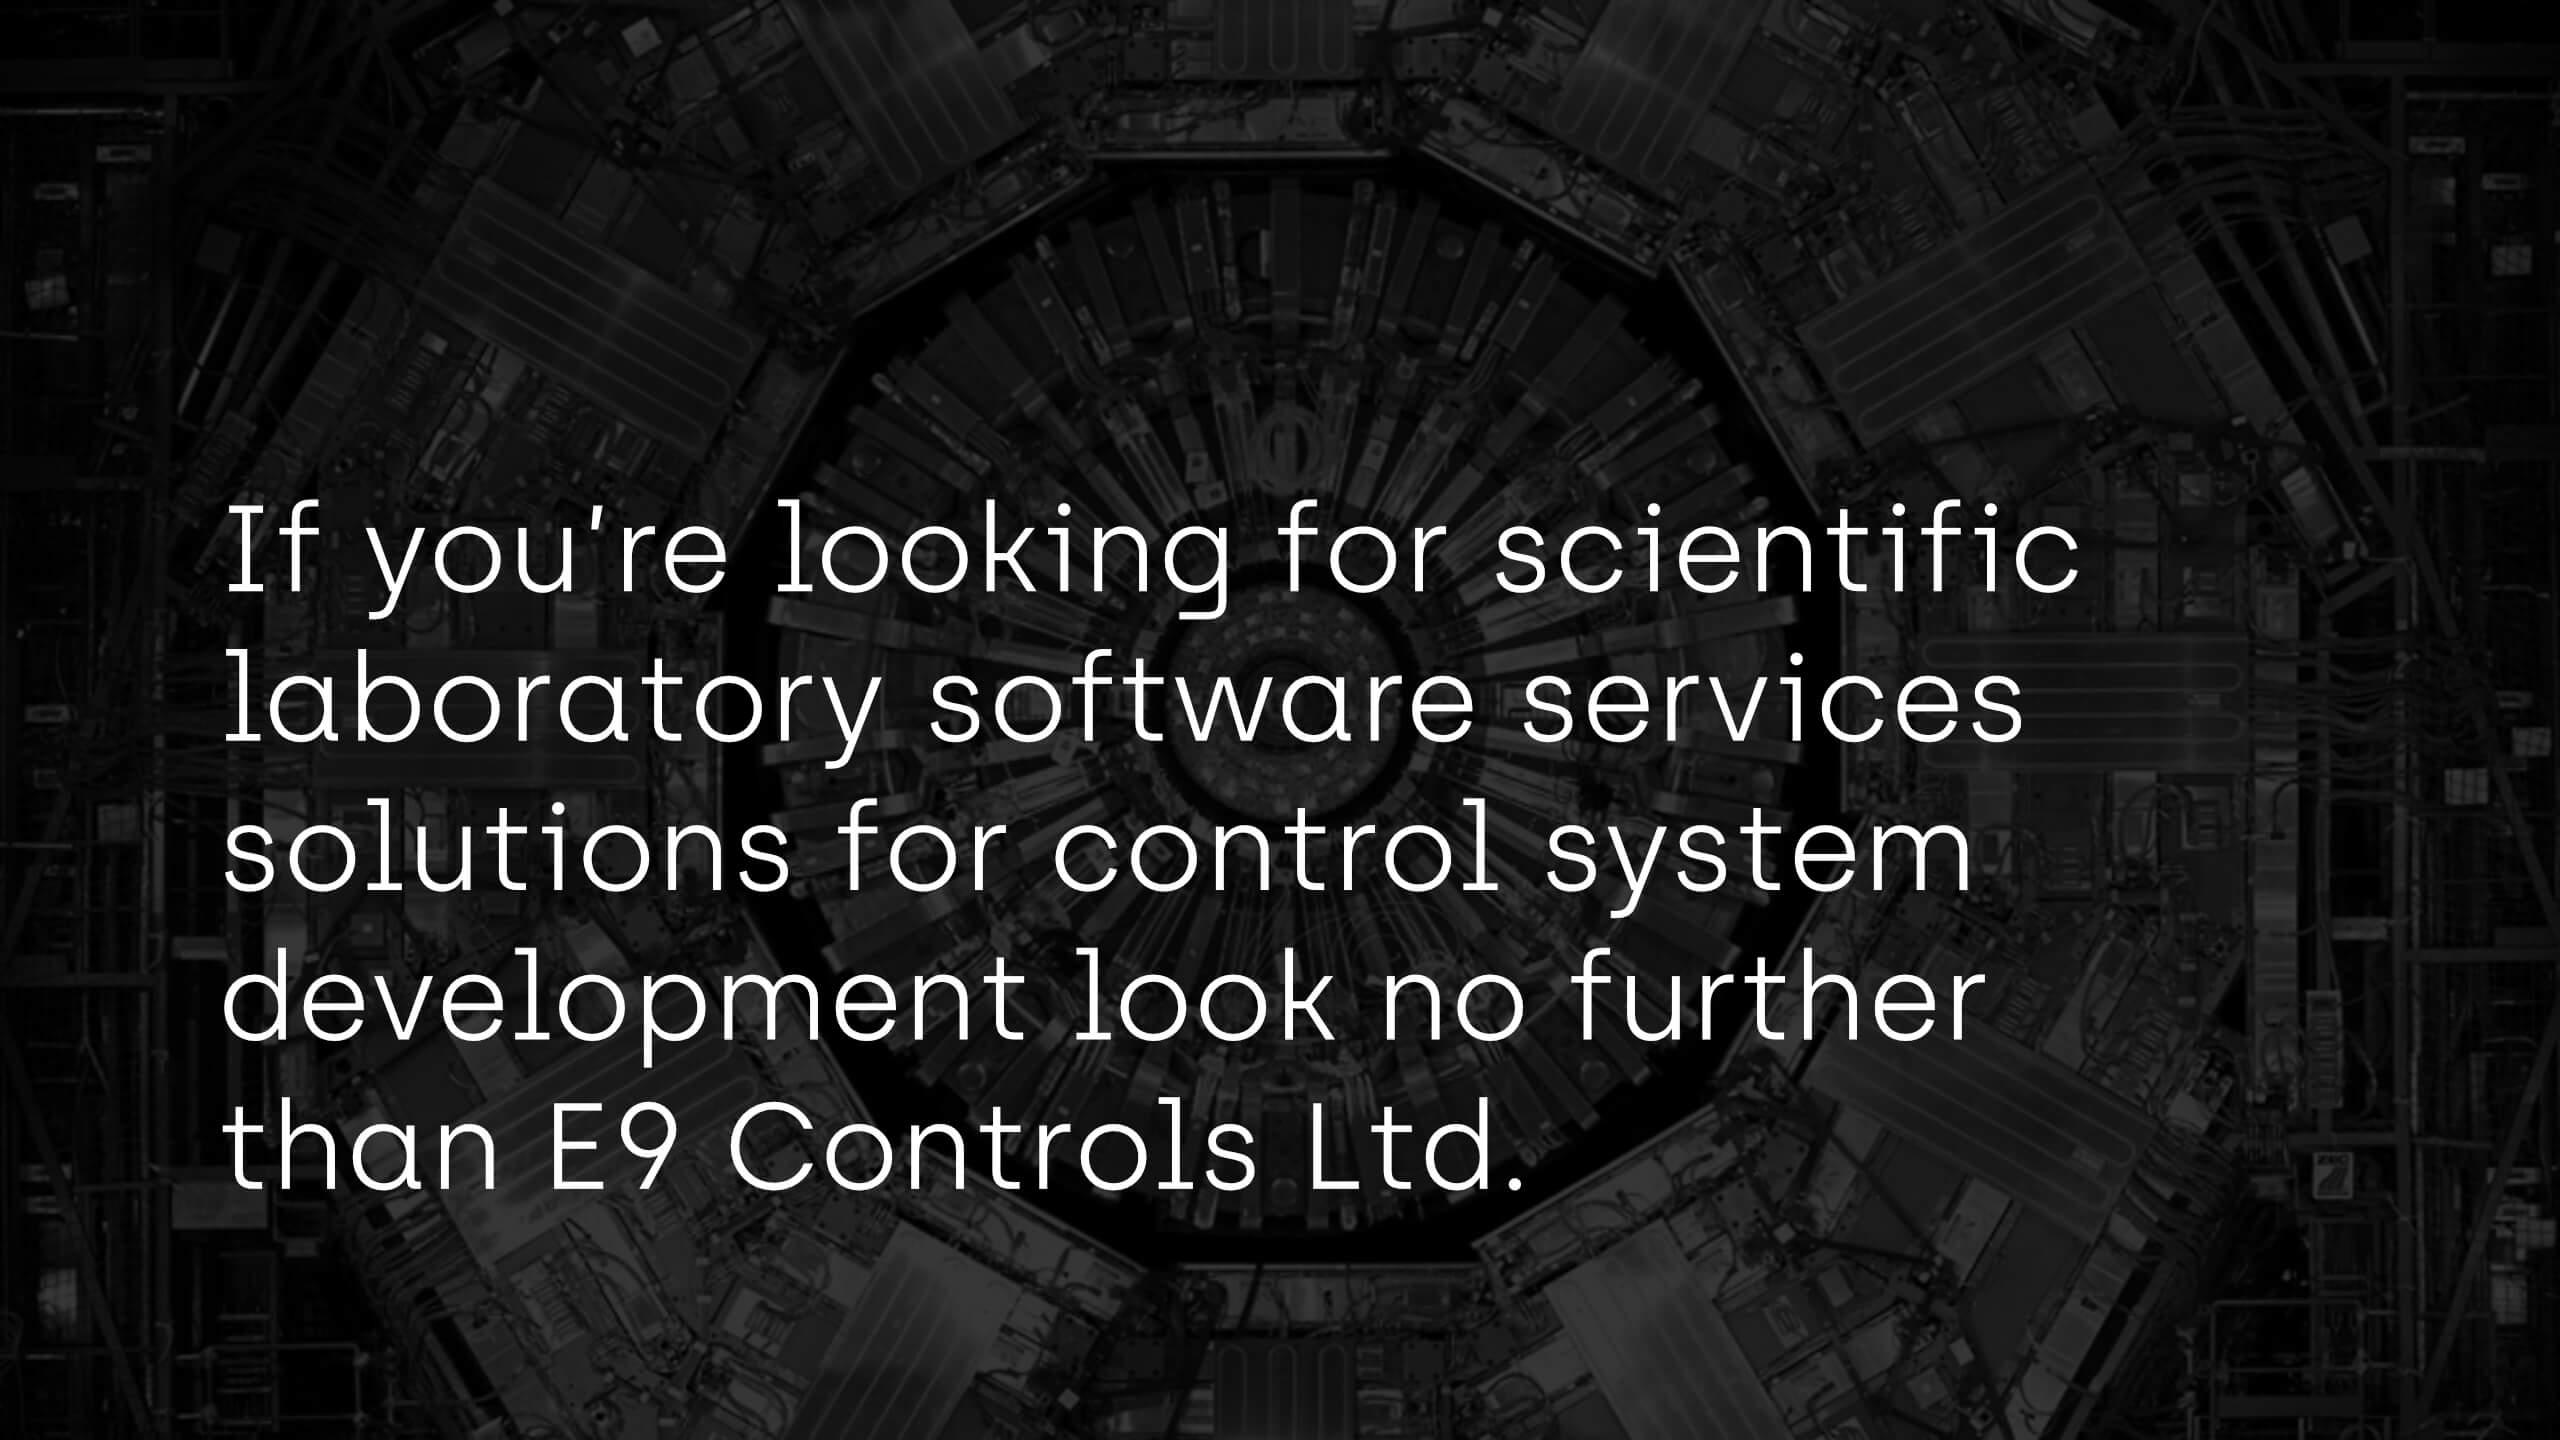 E9 Controls - Branding & Web Development